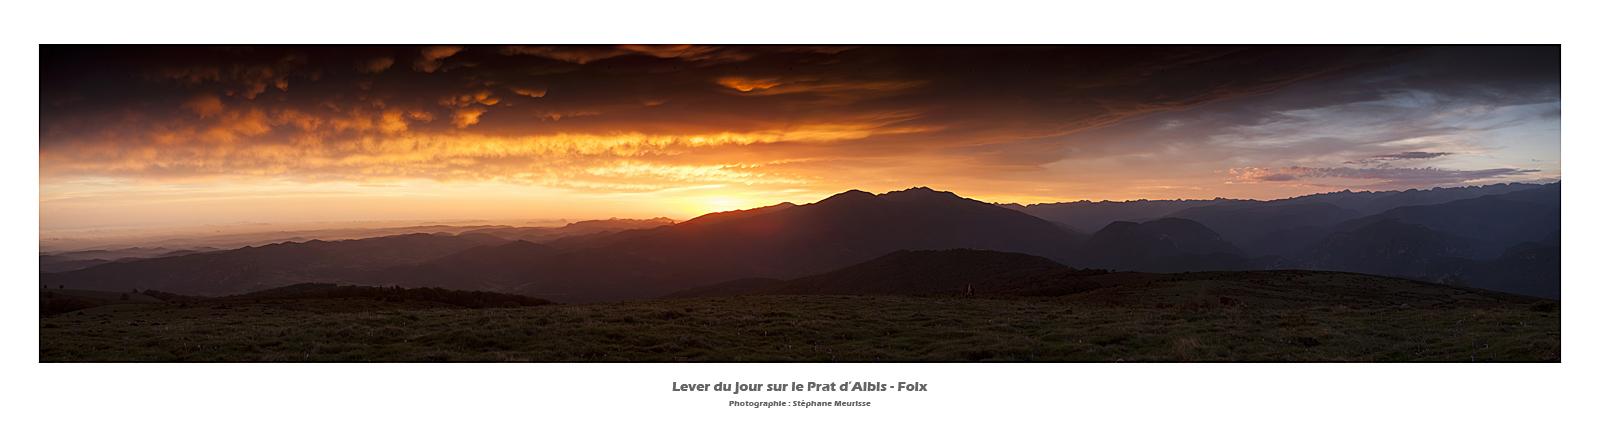 Prat d'Albis - Foix